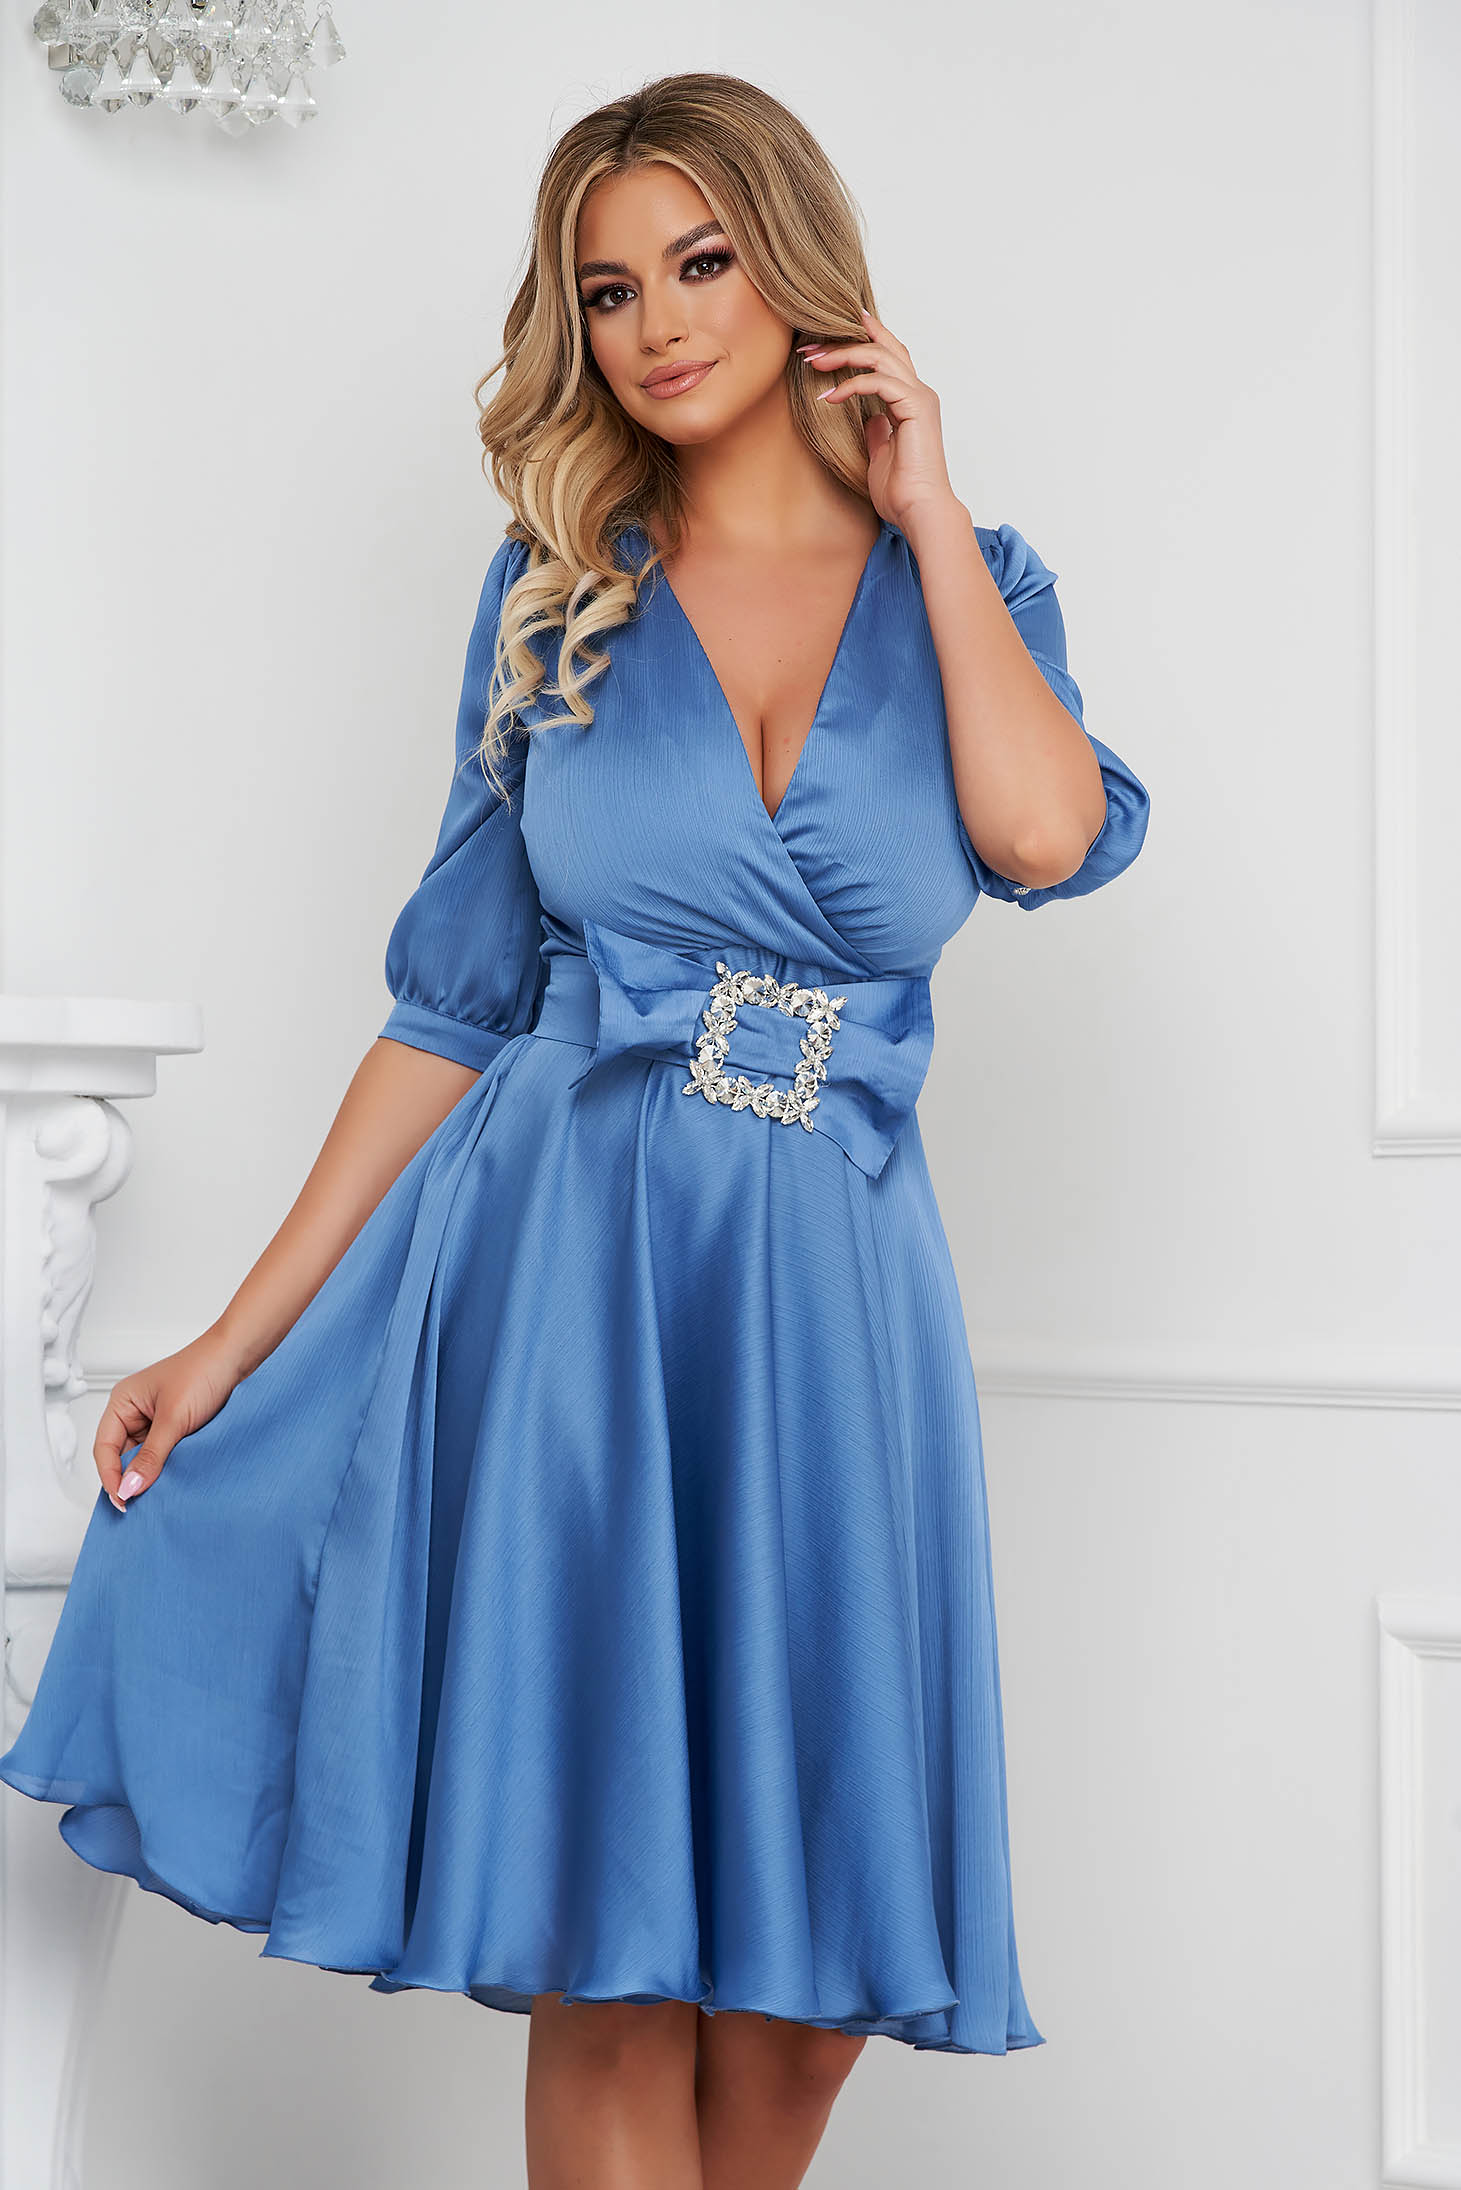 Lightblue dress elegant midi cloche from satin buckle accessory